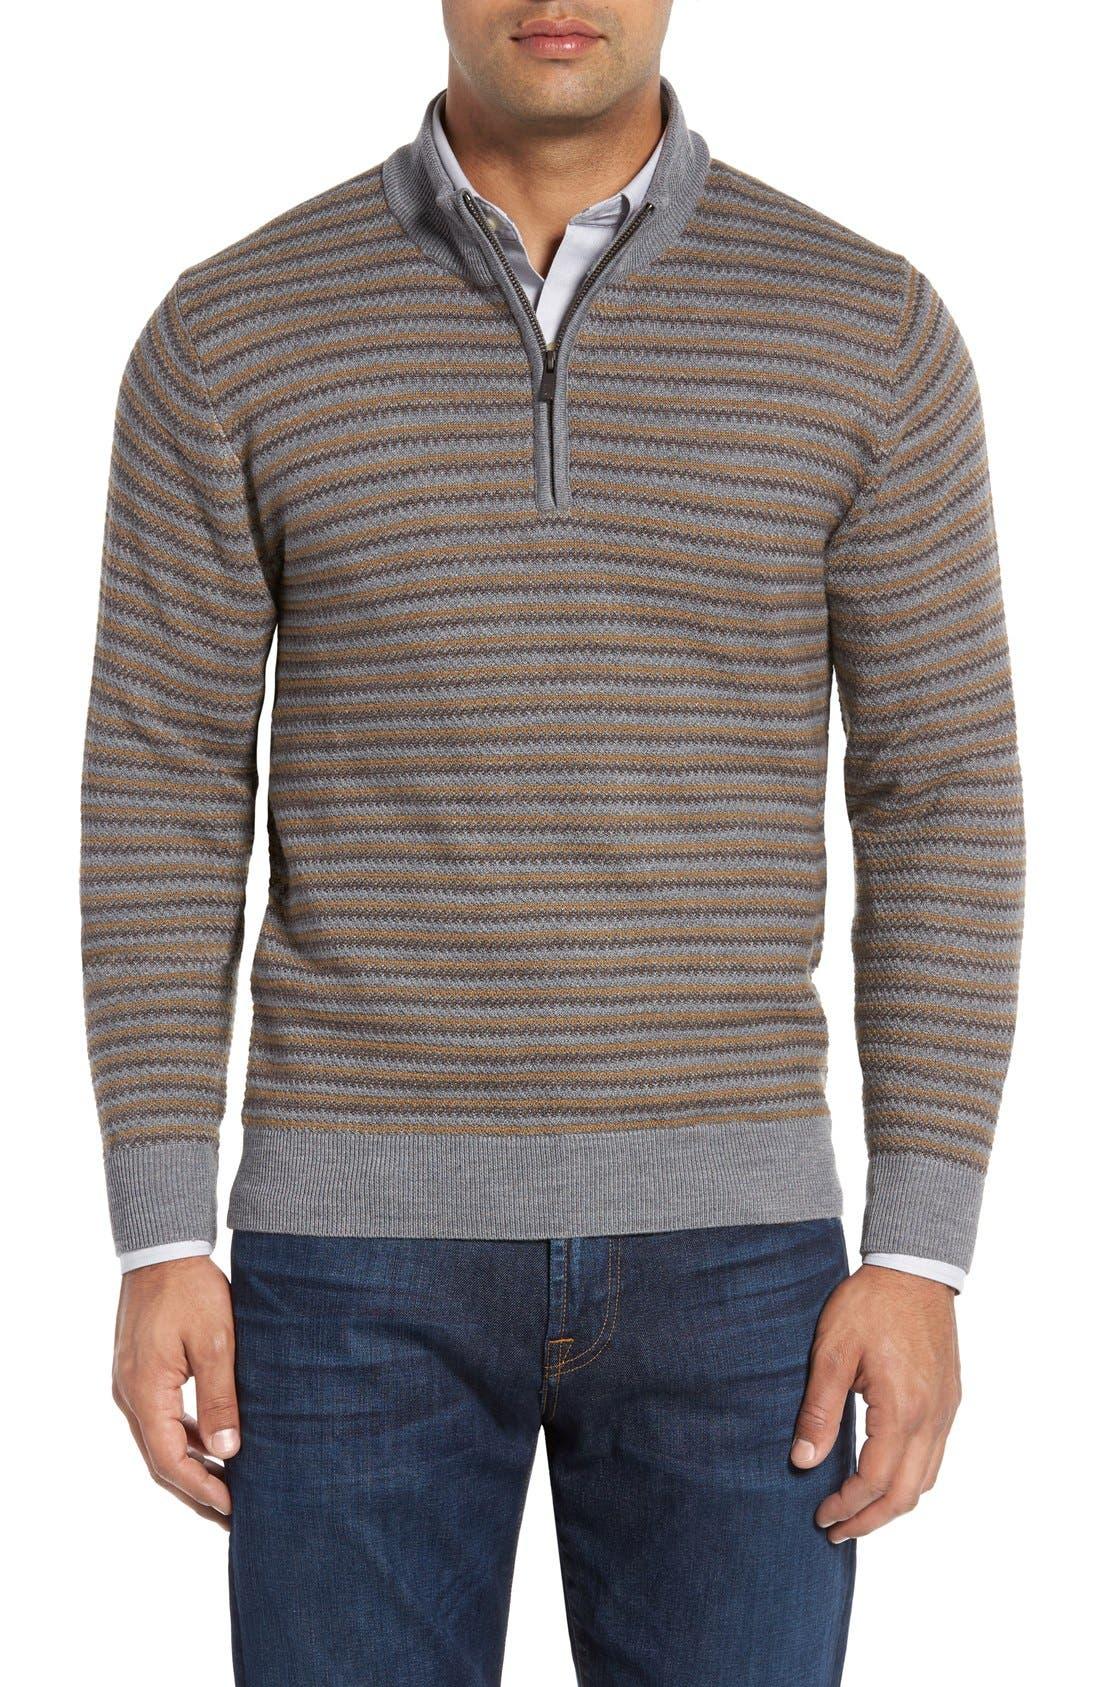 'Douglas Range' Quarter Zip Stripe Wool Blend Sweater,                             Main thumbnail 1, color,                             200